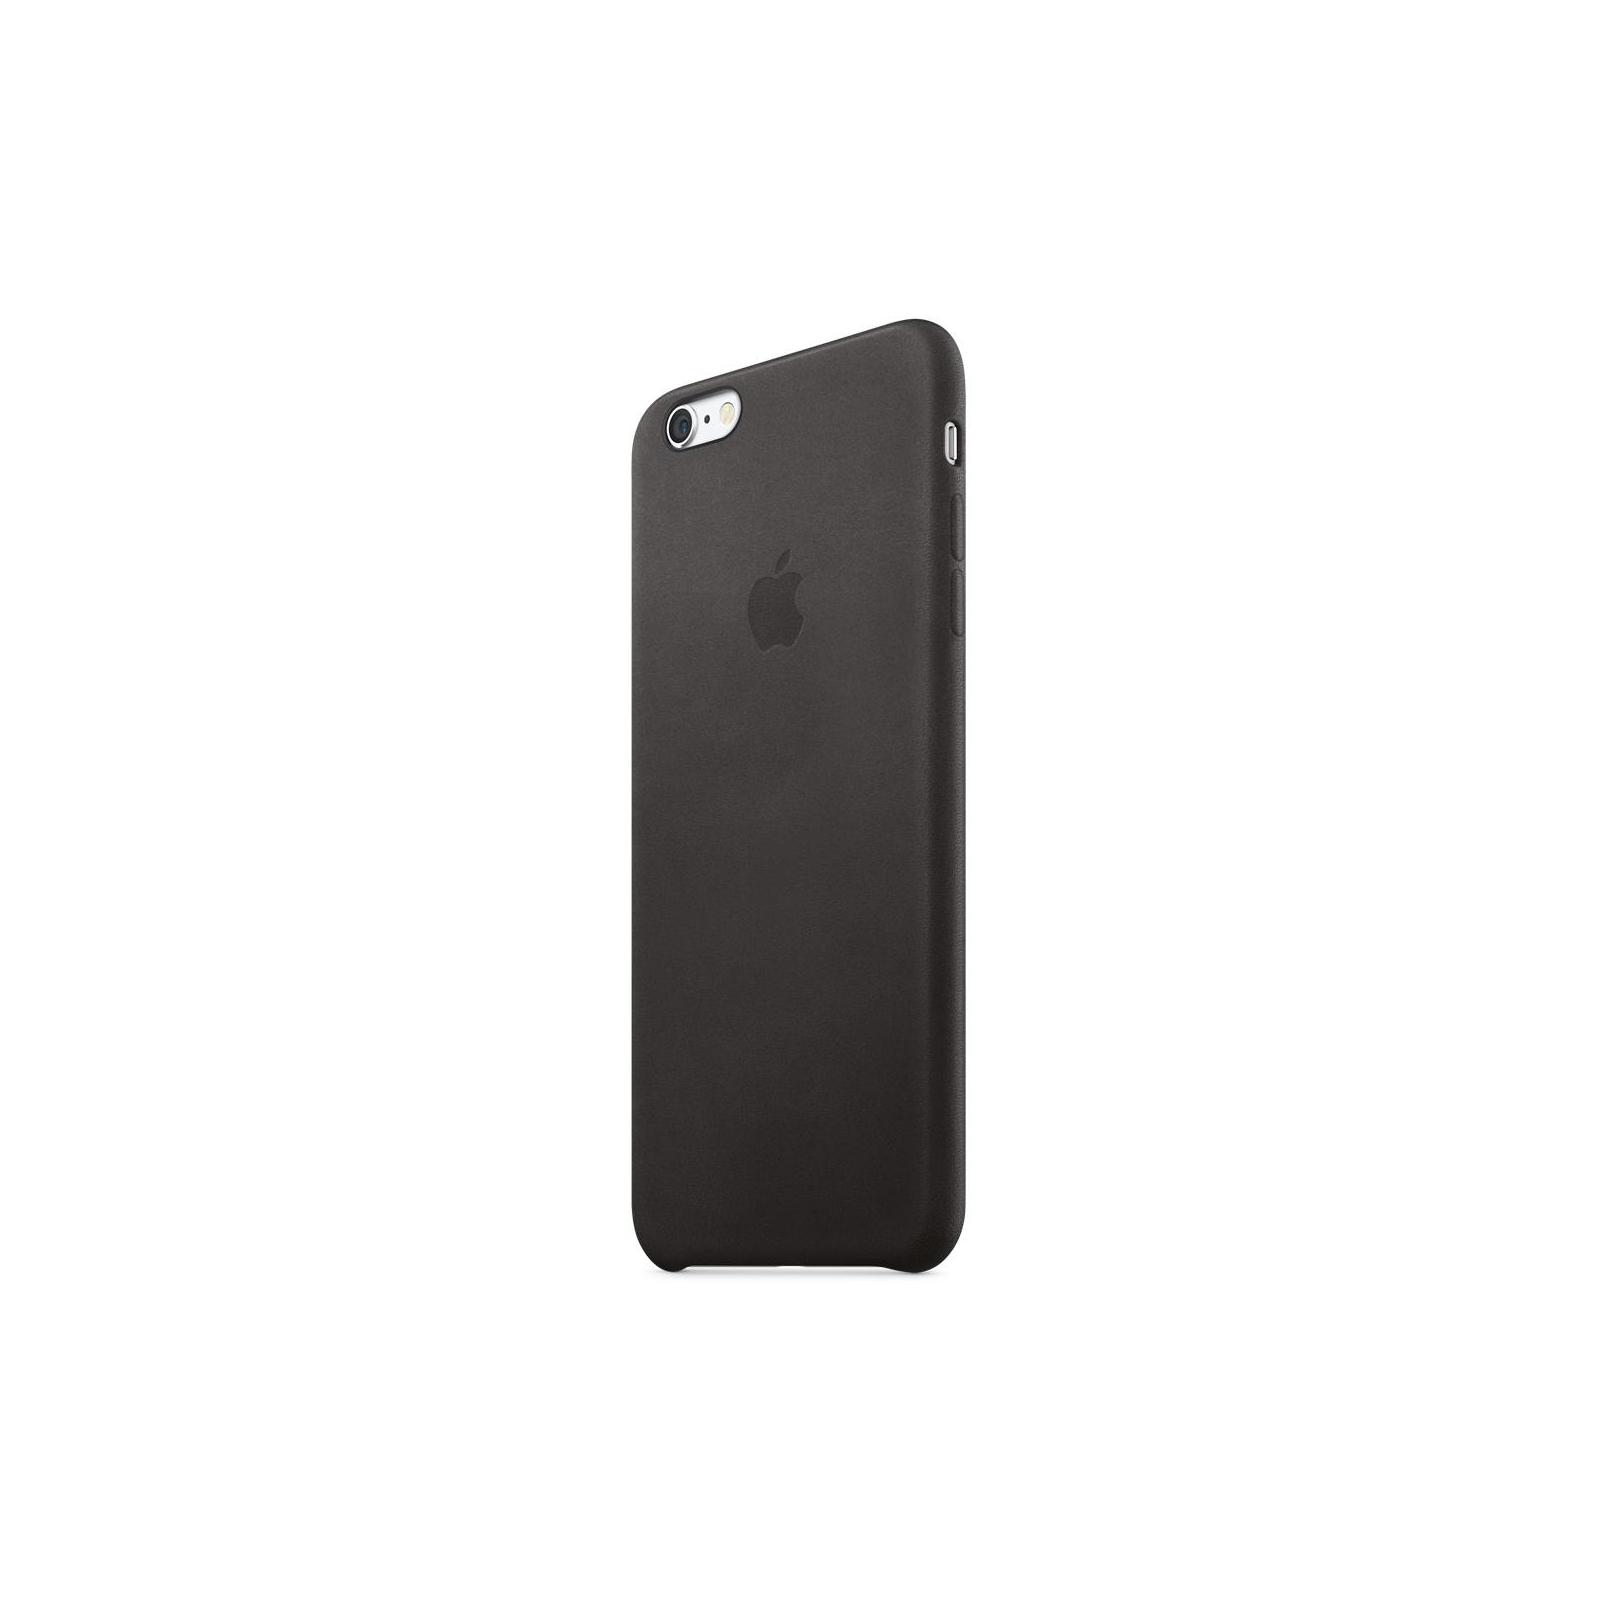 Чехол для моб. телефона Apple для iPhone 6 Plus/6s Plus Charcoal Gray (MKXJ2ZM/A) изображение 2